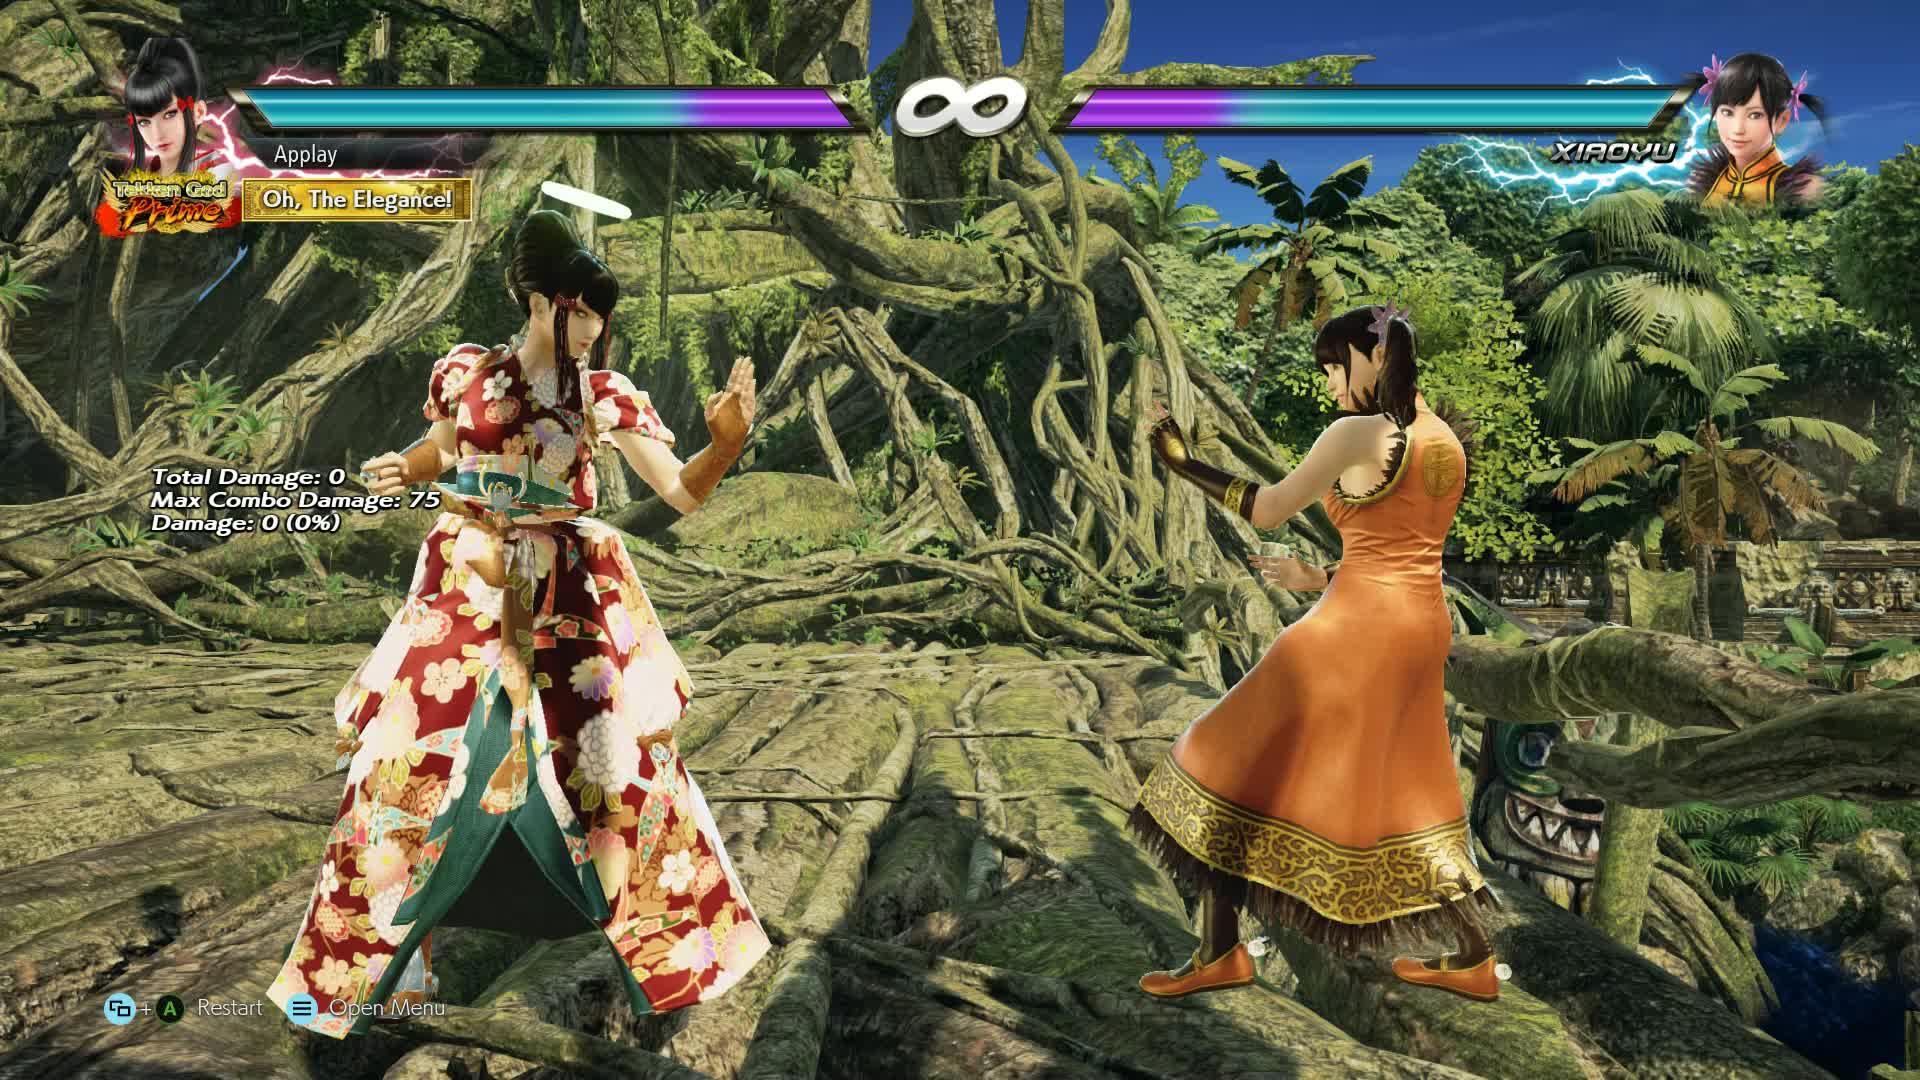 Kazumi, Tekken, Tekken 7, Kazumi - Jungle Outpost optmized balcony combo GIFs